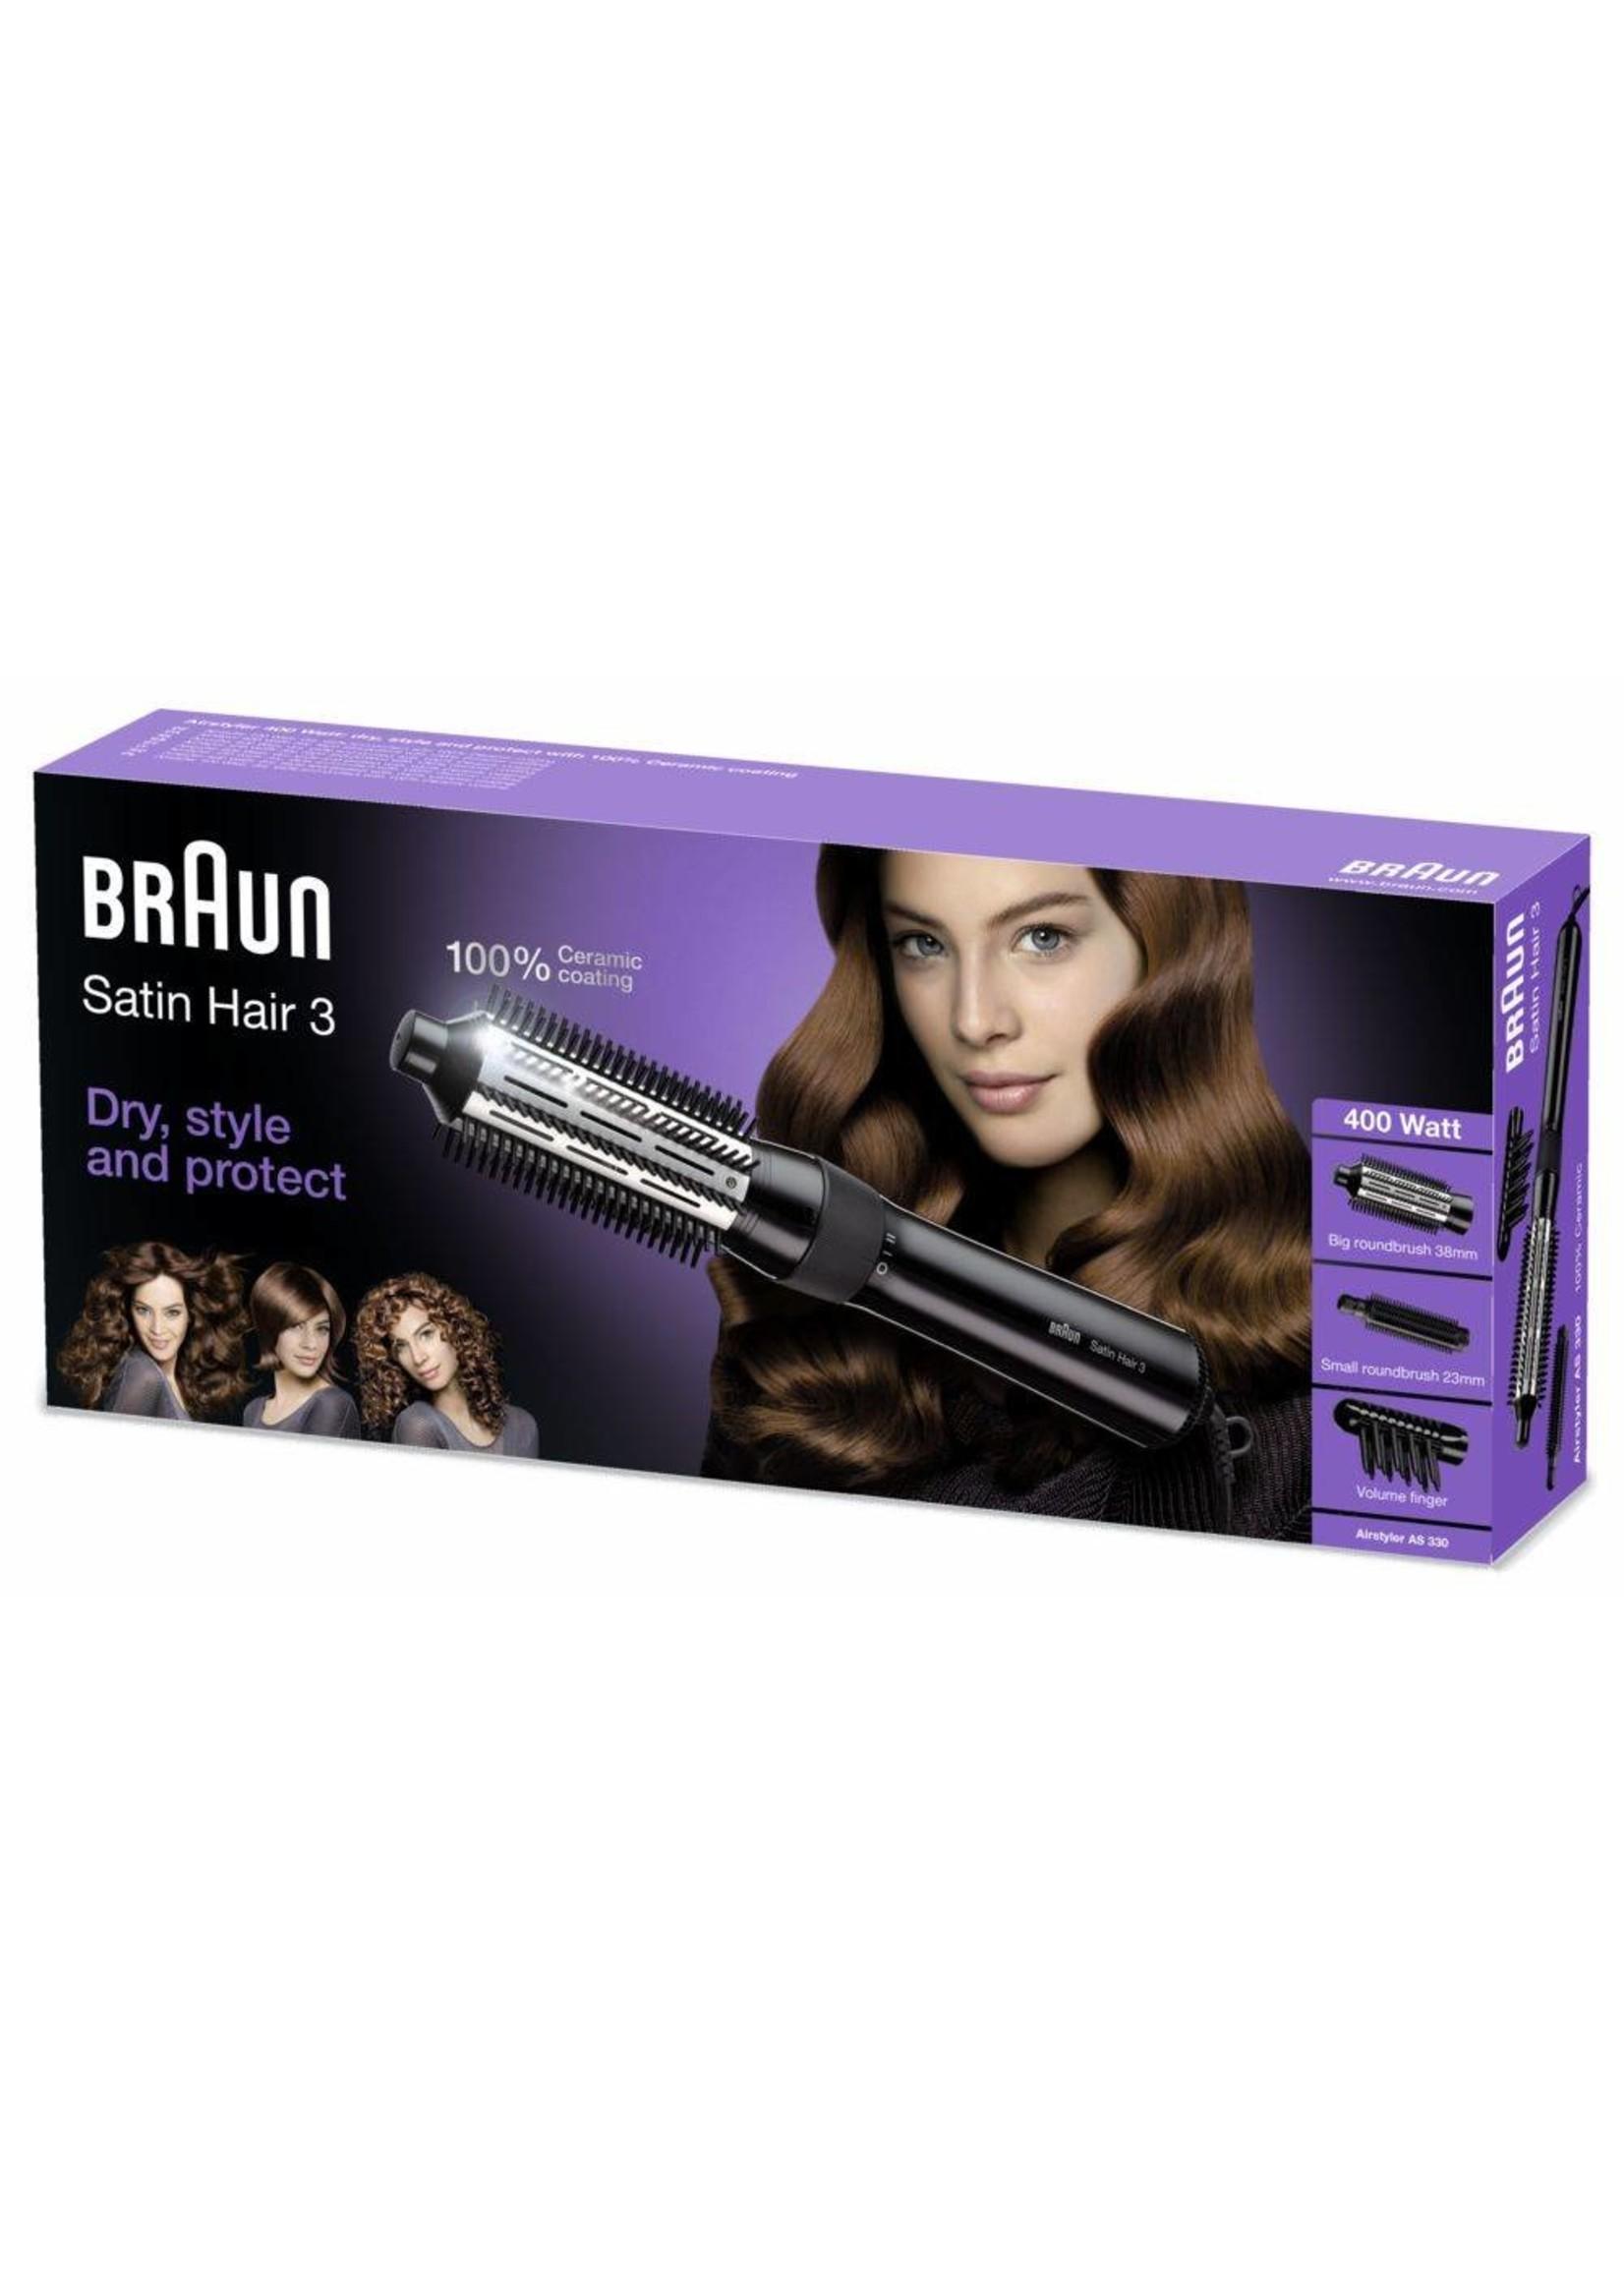 Braun Braun Satin Hair 3 AS 330 Krulborstel